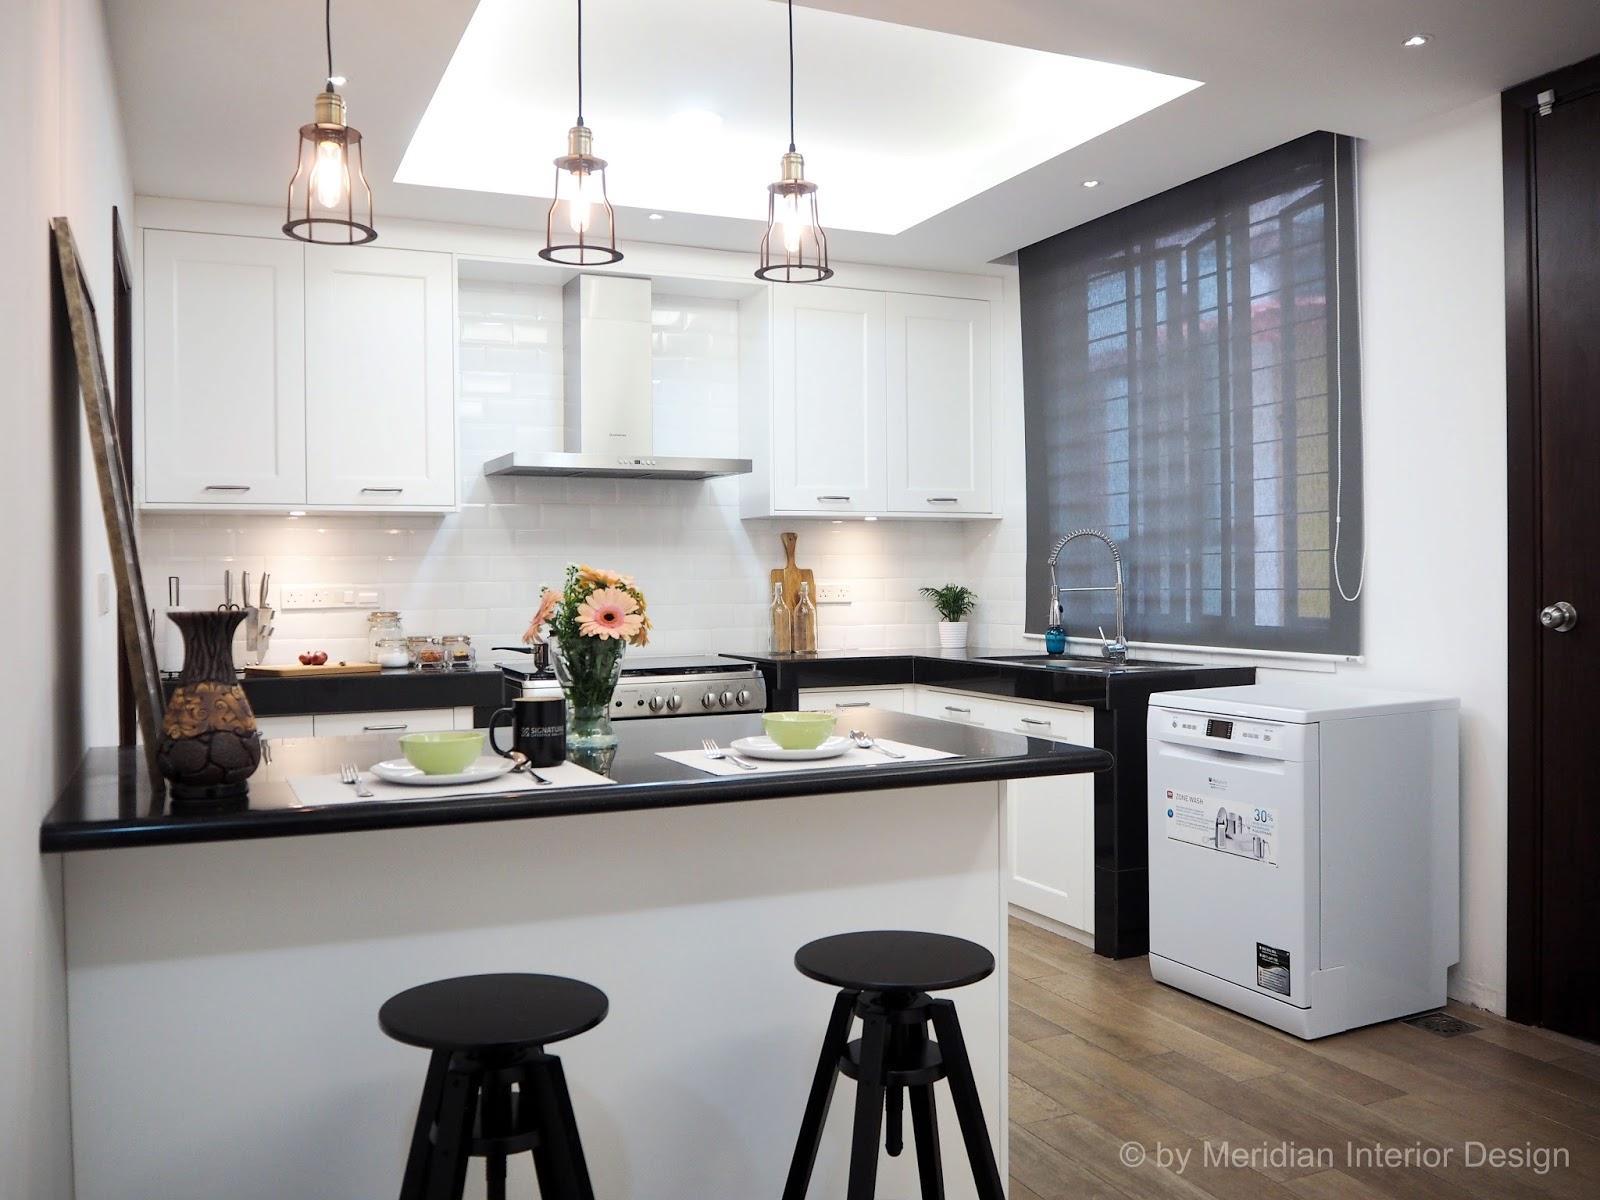 Meridian - Interior Design and Kitchen Design, in Kuala ...